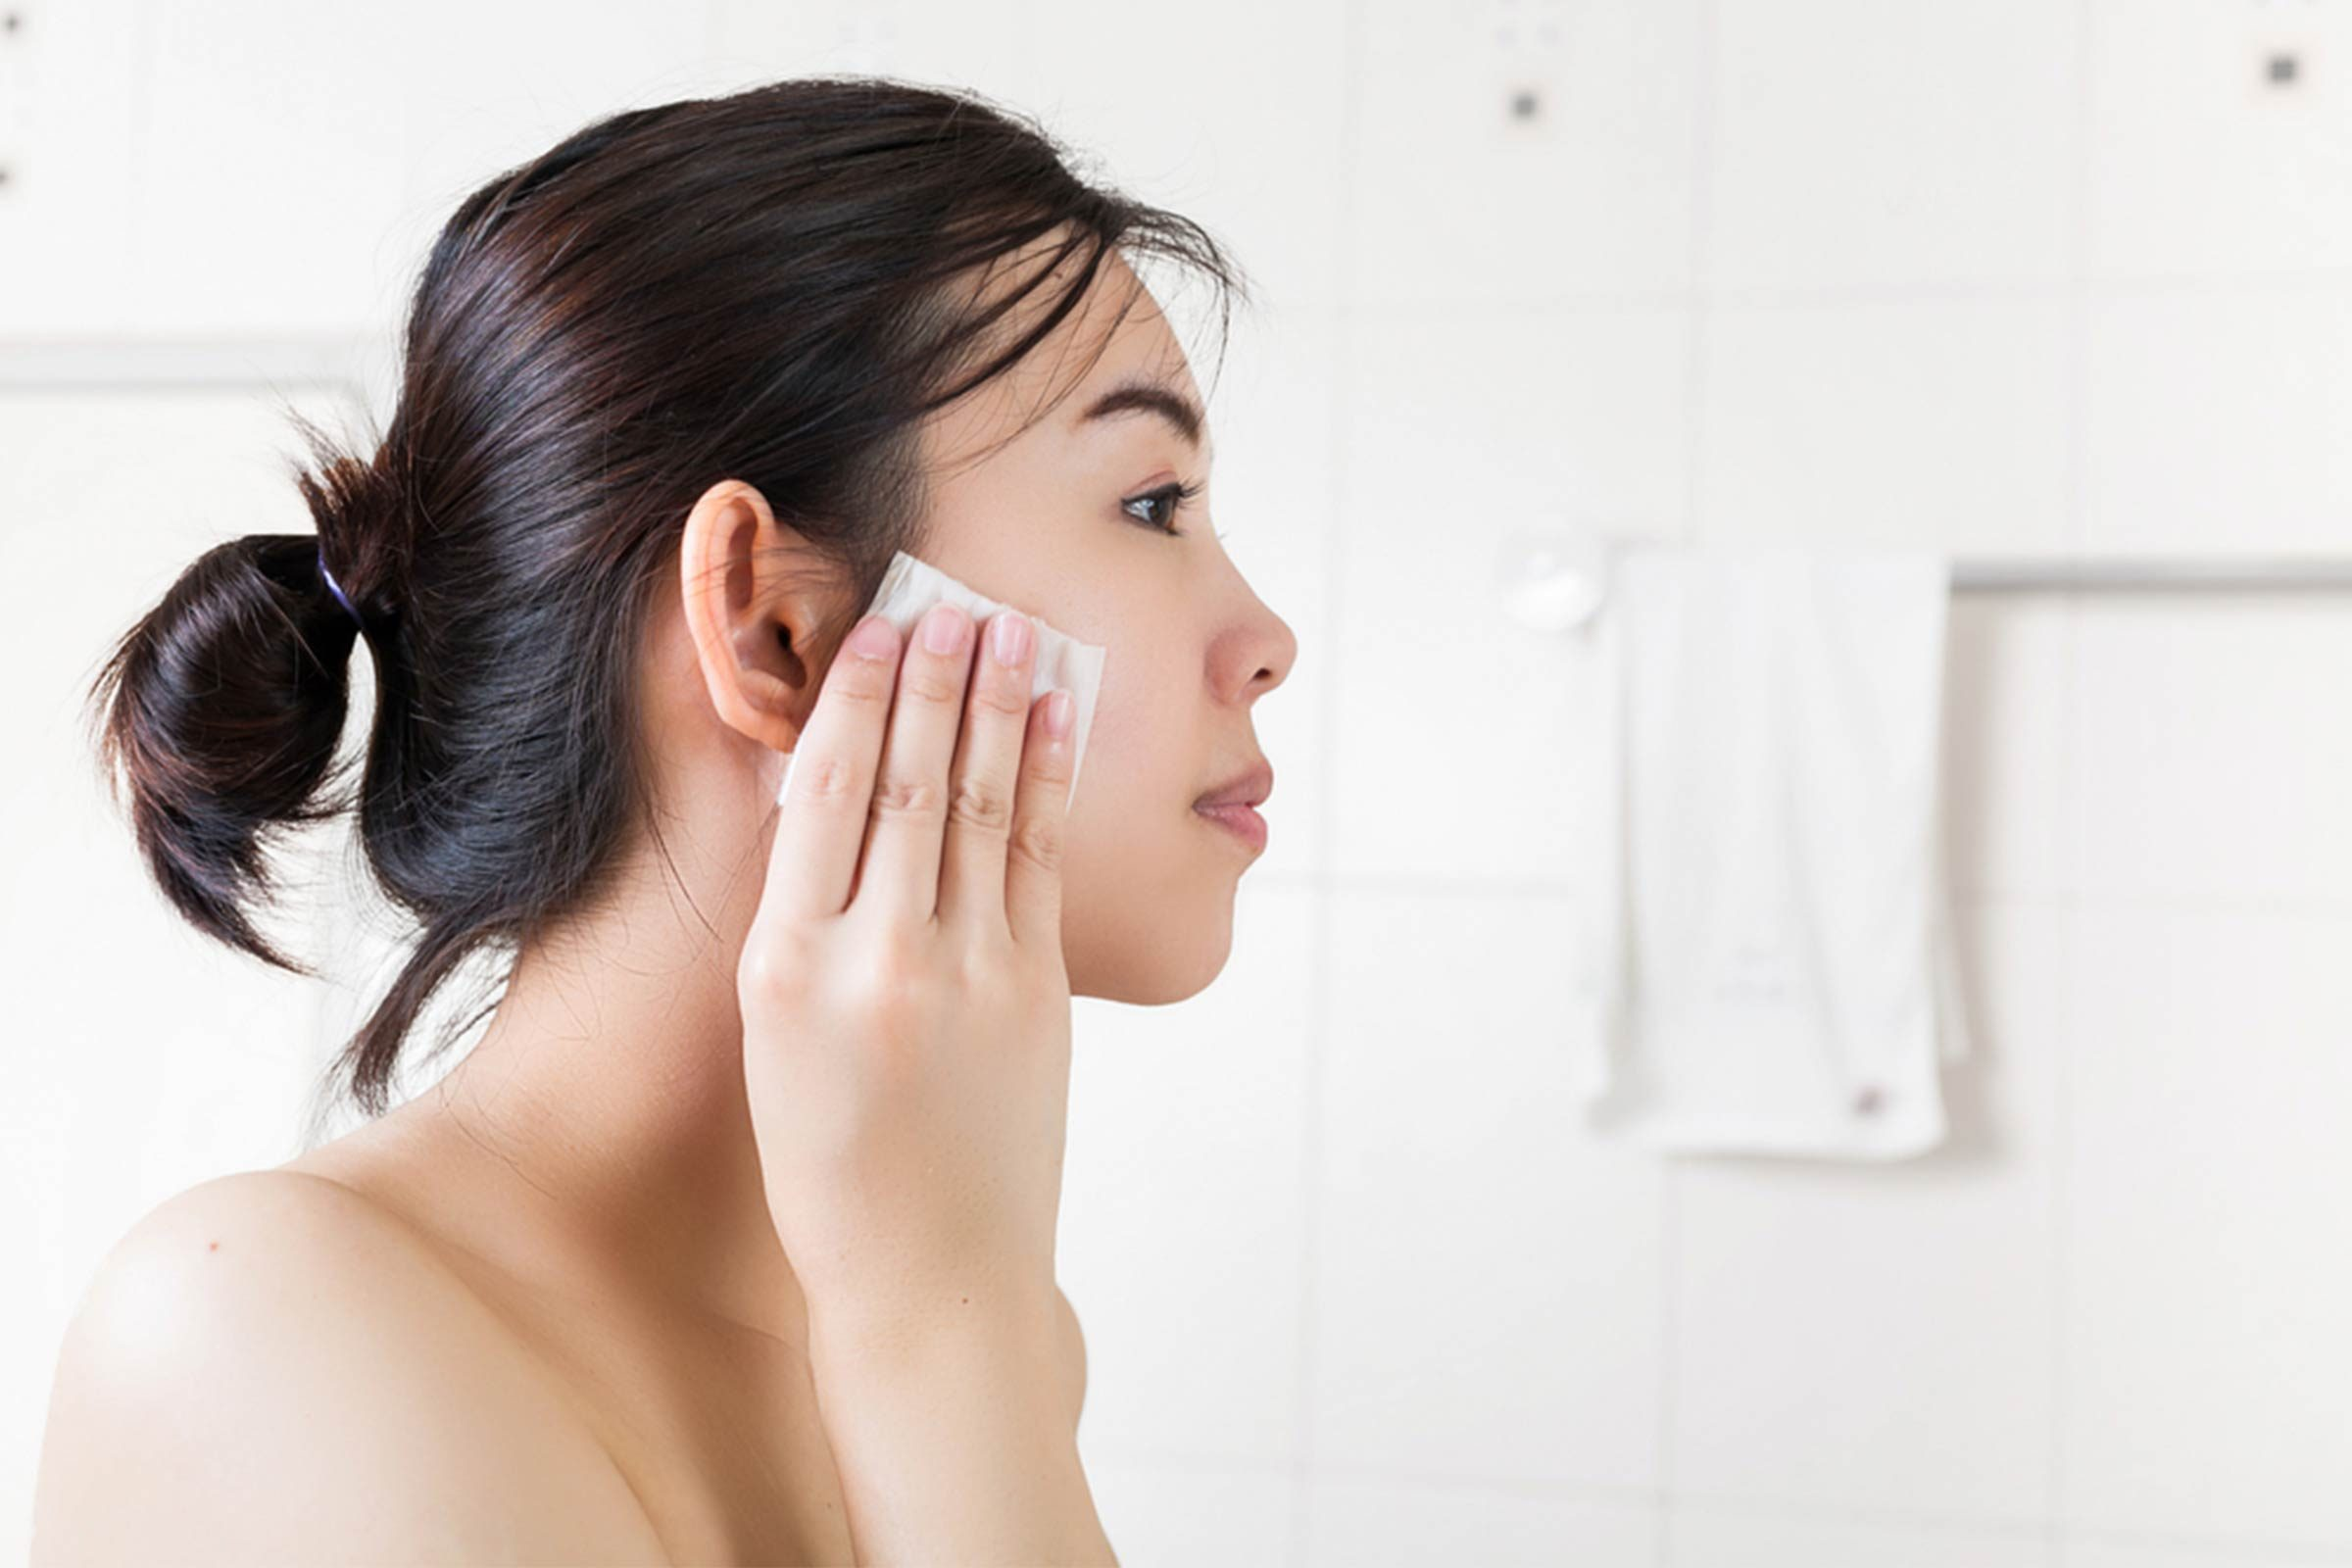 07-toner-amazing-tricks-for-healthy-glowing-skin-557276806-Zynatis